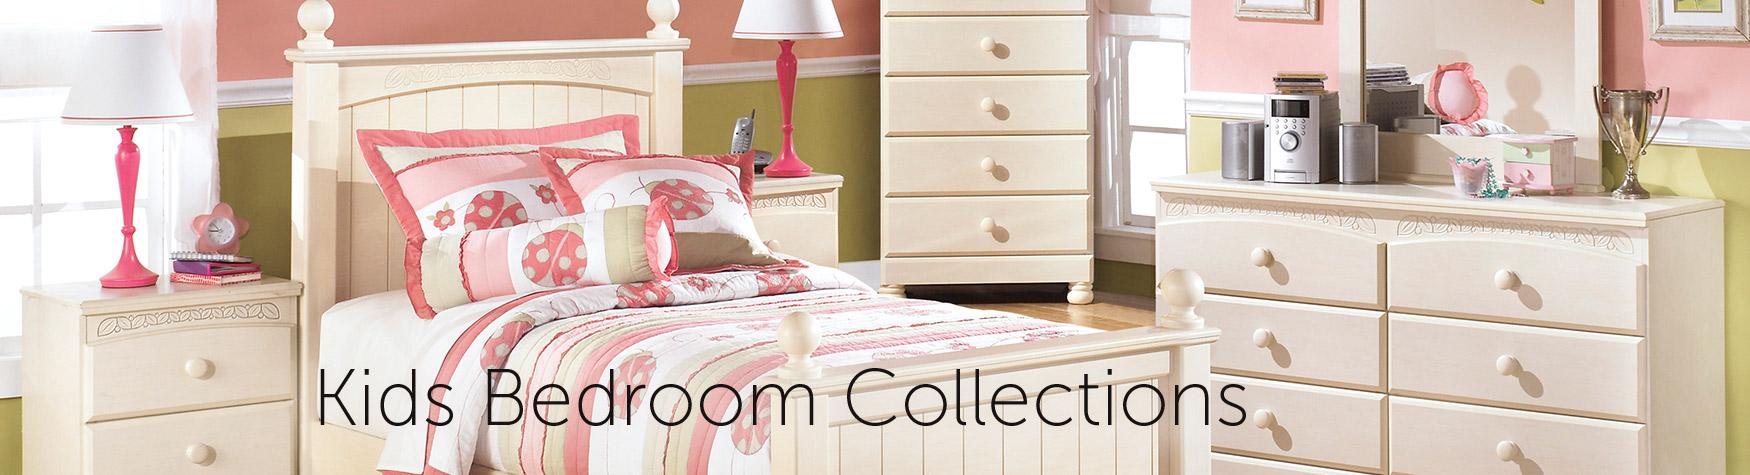 kids-bedroom-collection-banner.jpg